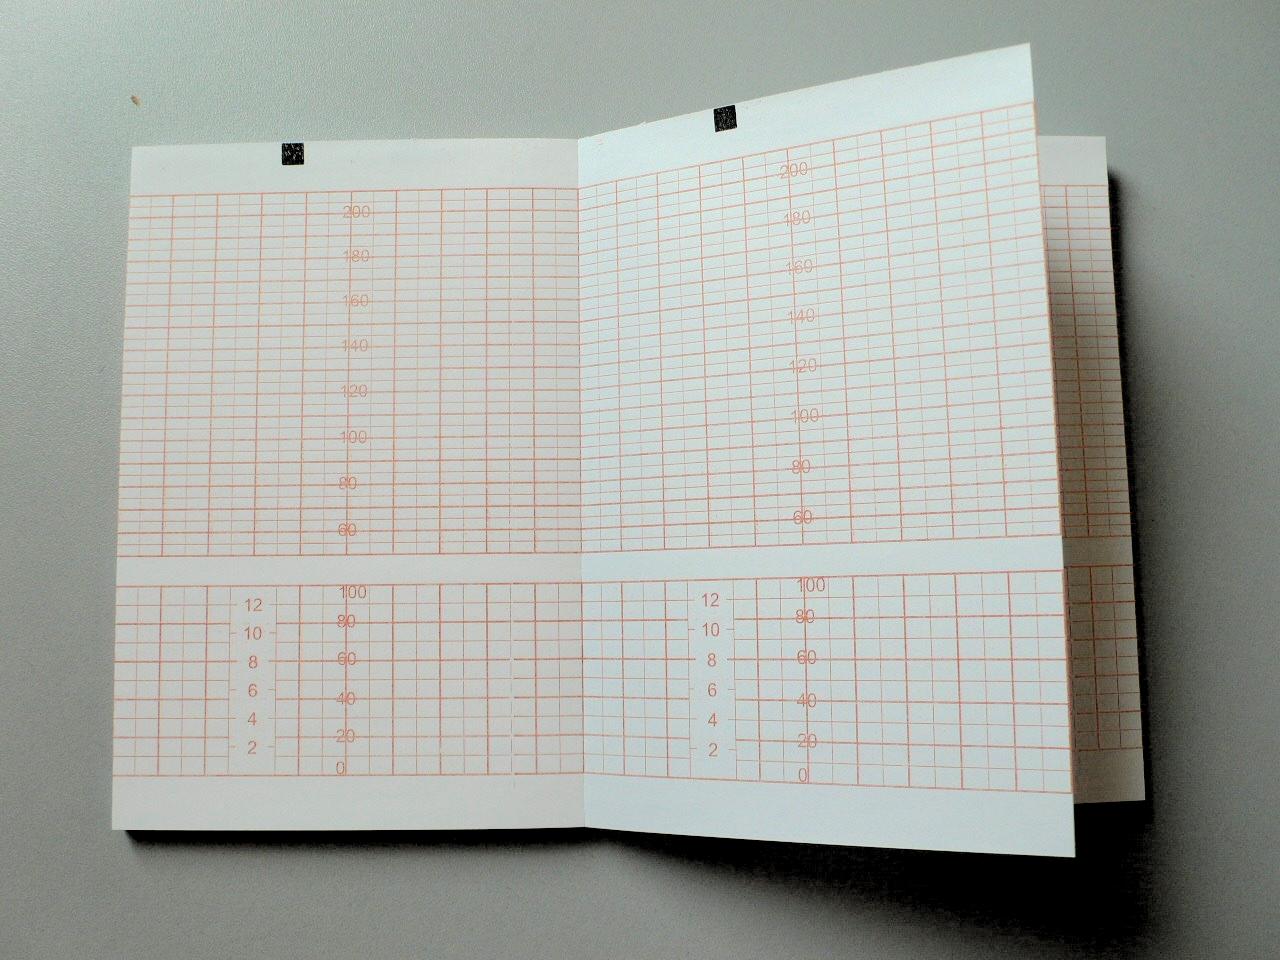 150х100х150, бумага КТГ для Hewlett Packard (Phillips), Avalon FM , реестр 4058